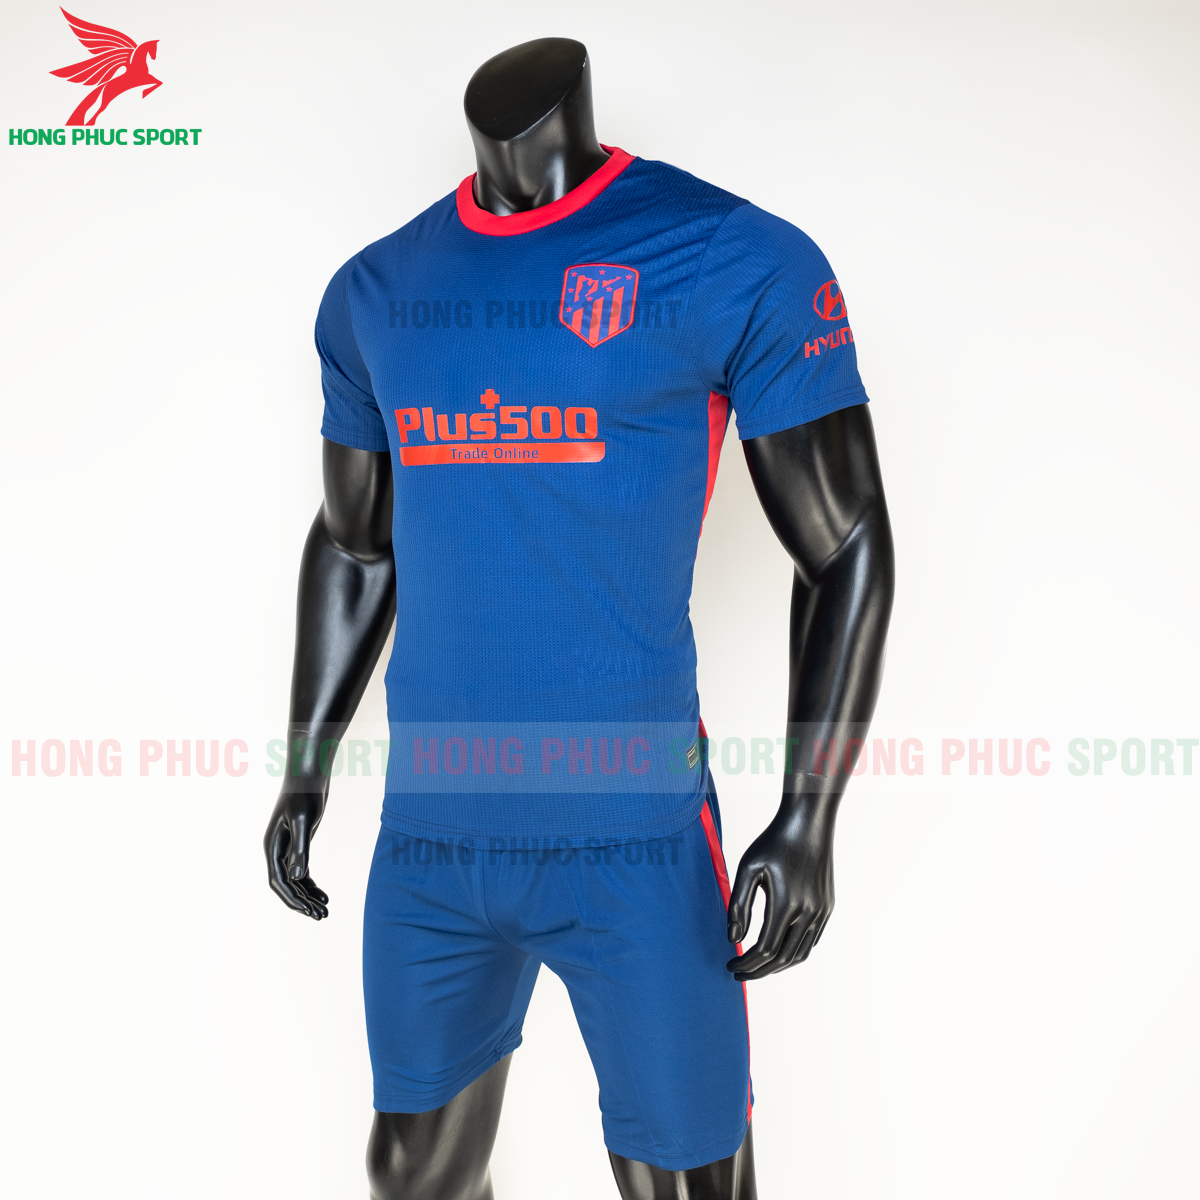 https://cdn.hongphucsport.com/unsafe/s4.shopbay.vn/files/285/ao-bong-da-atletico-madrid-20-21-san-khach-hang-thailand-4-5fae4648be291.png